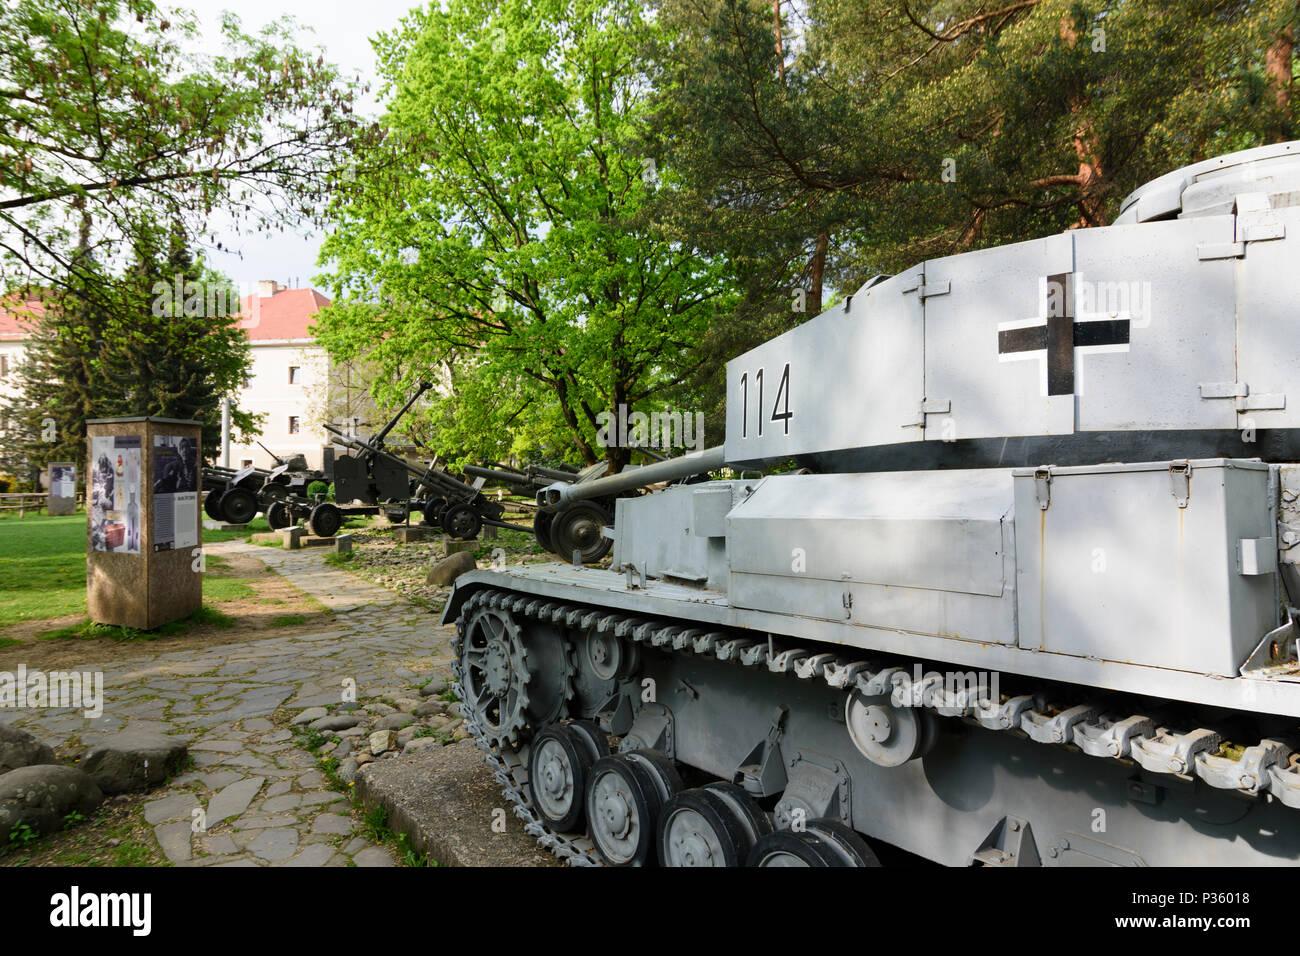 Banska Bystrica (Neusohl): museum at the Memorial of the Slovak